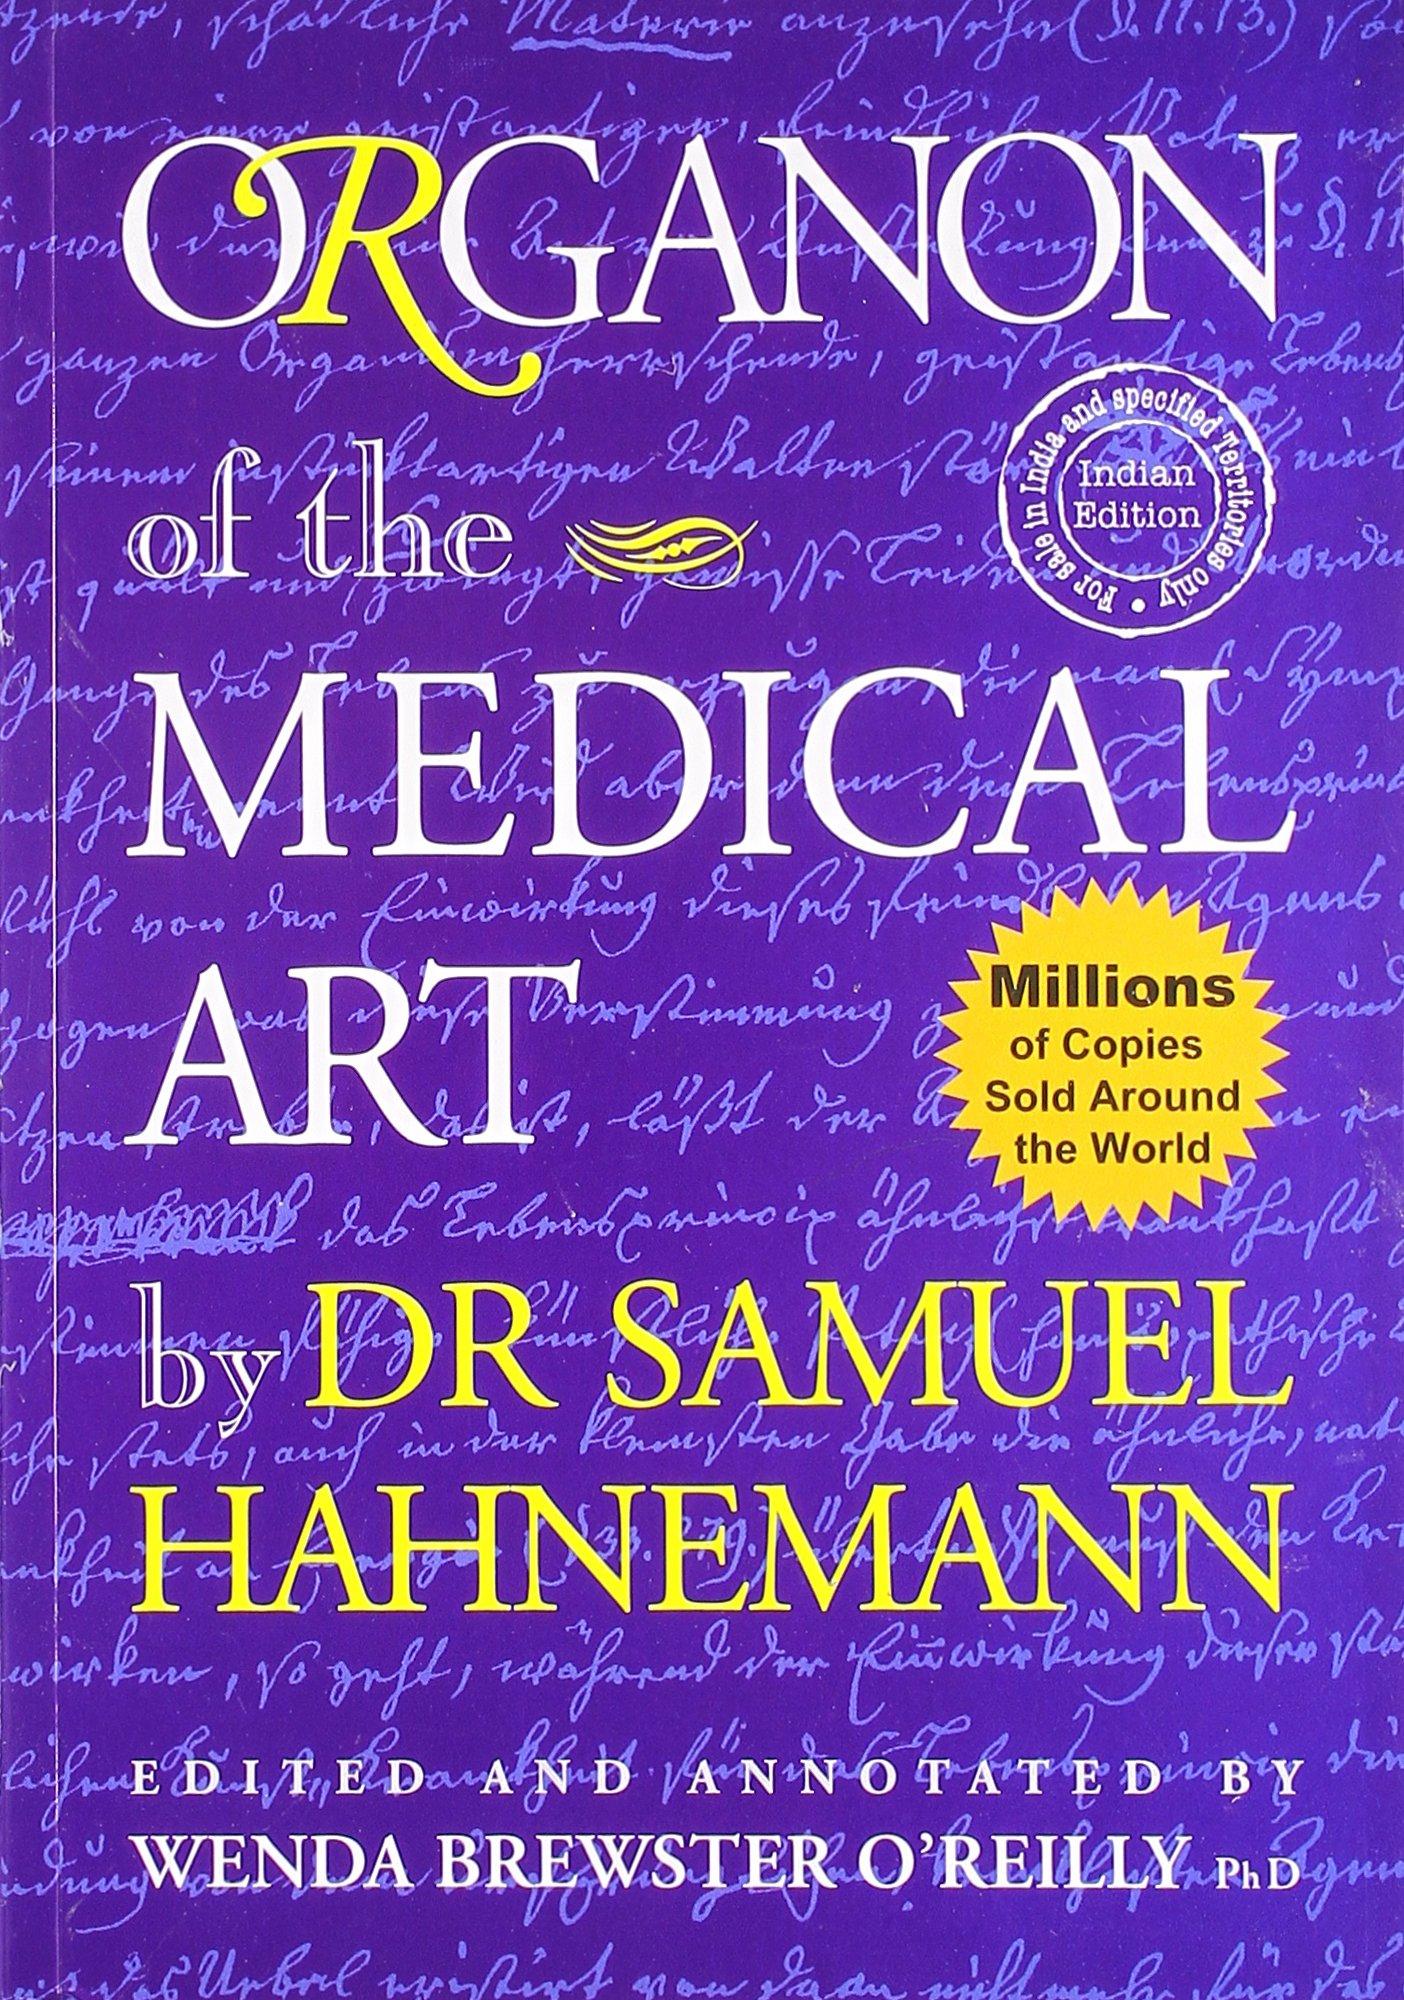 Organon of the medical art by samuel hahnemann memorial steroids australia supplier